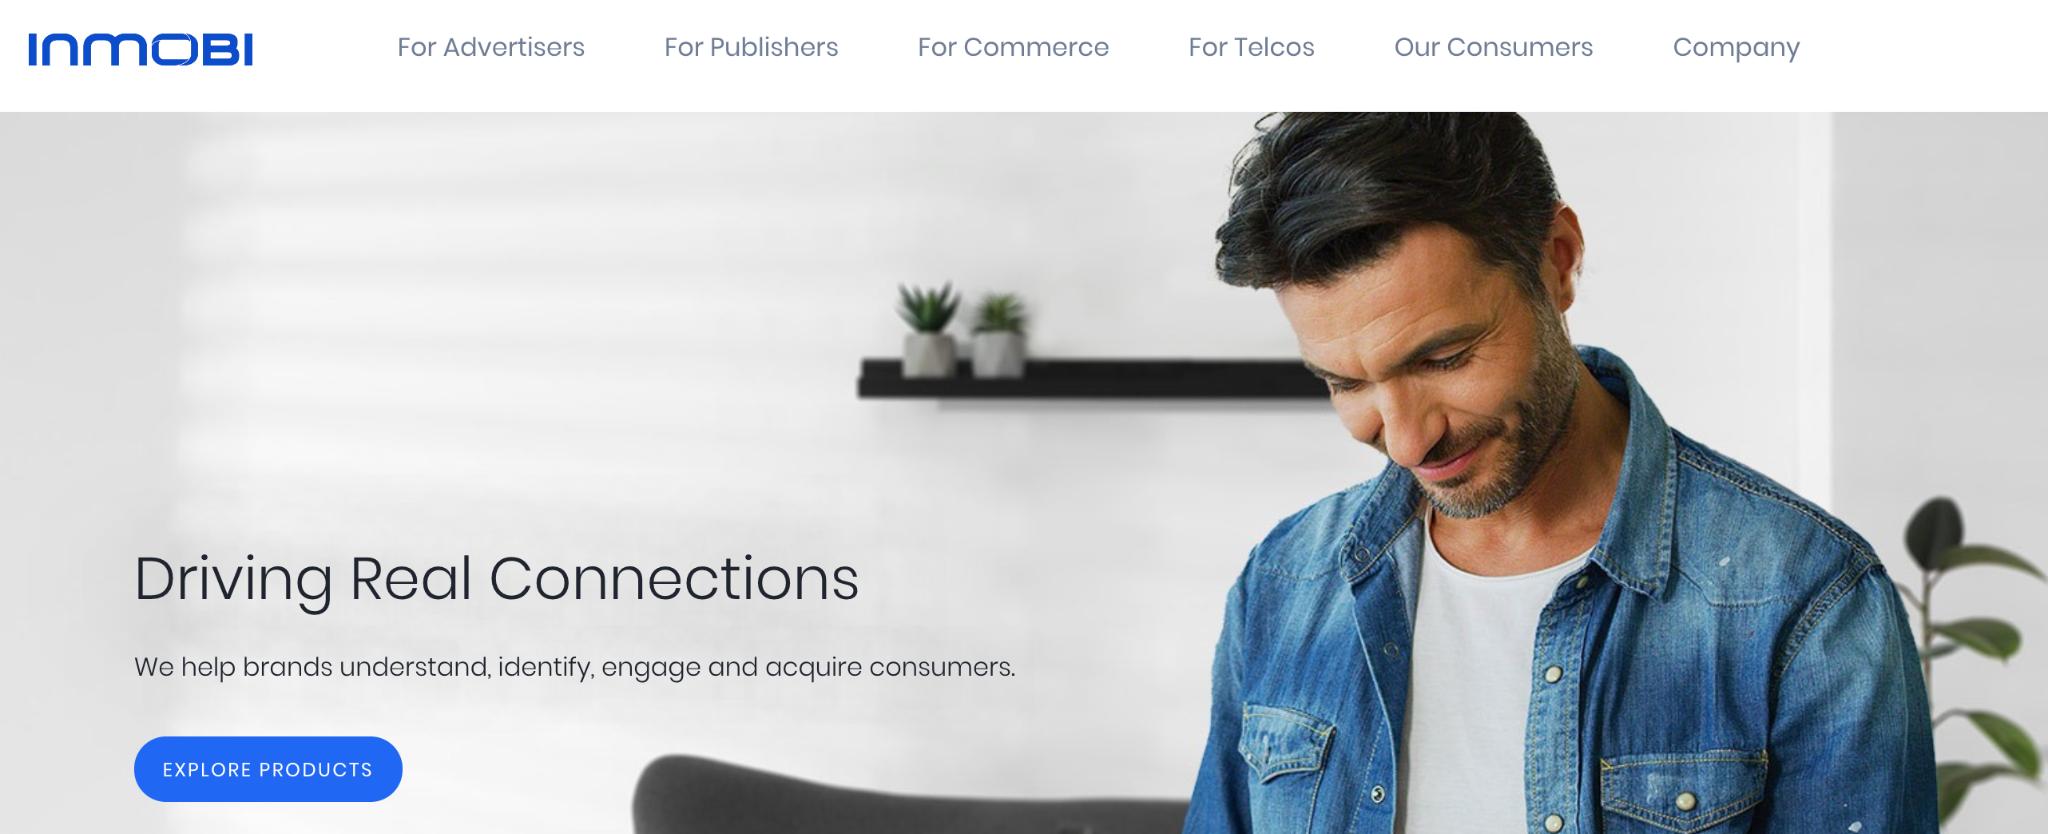 InMobi Homepage